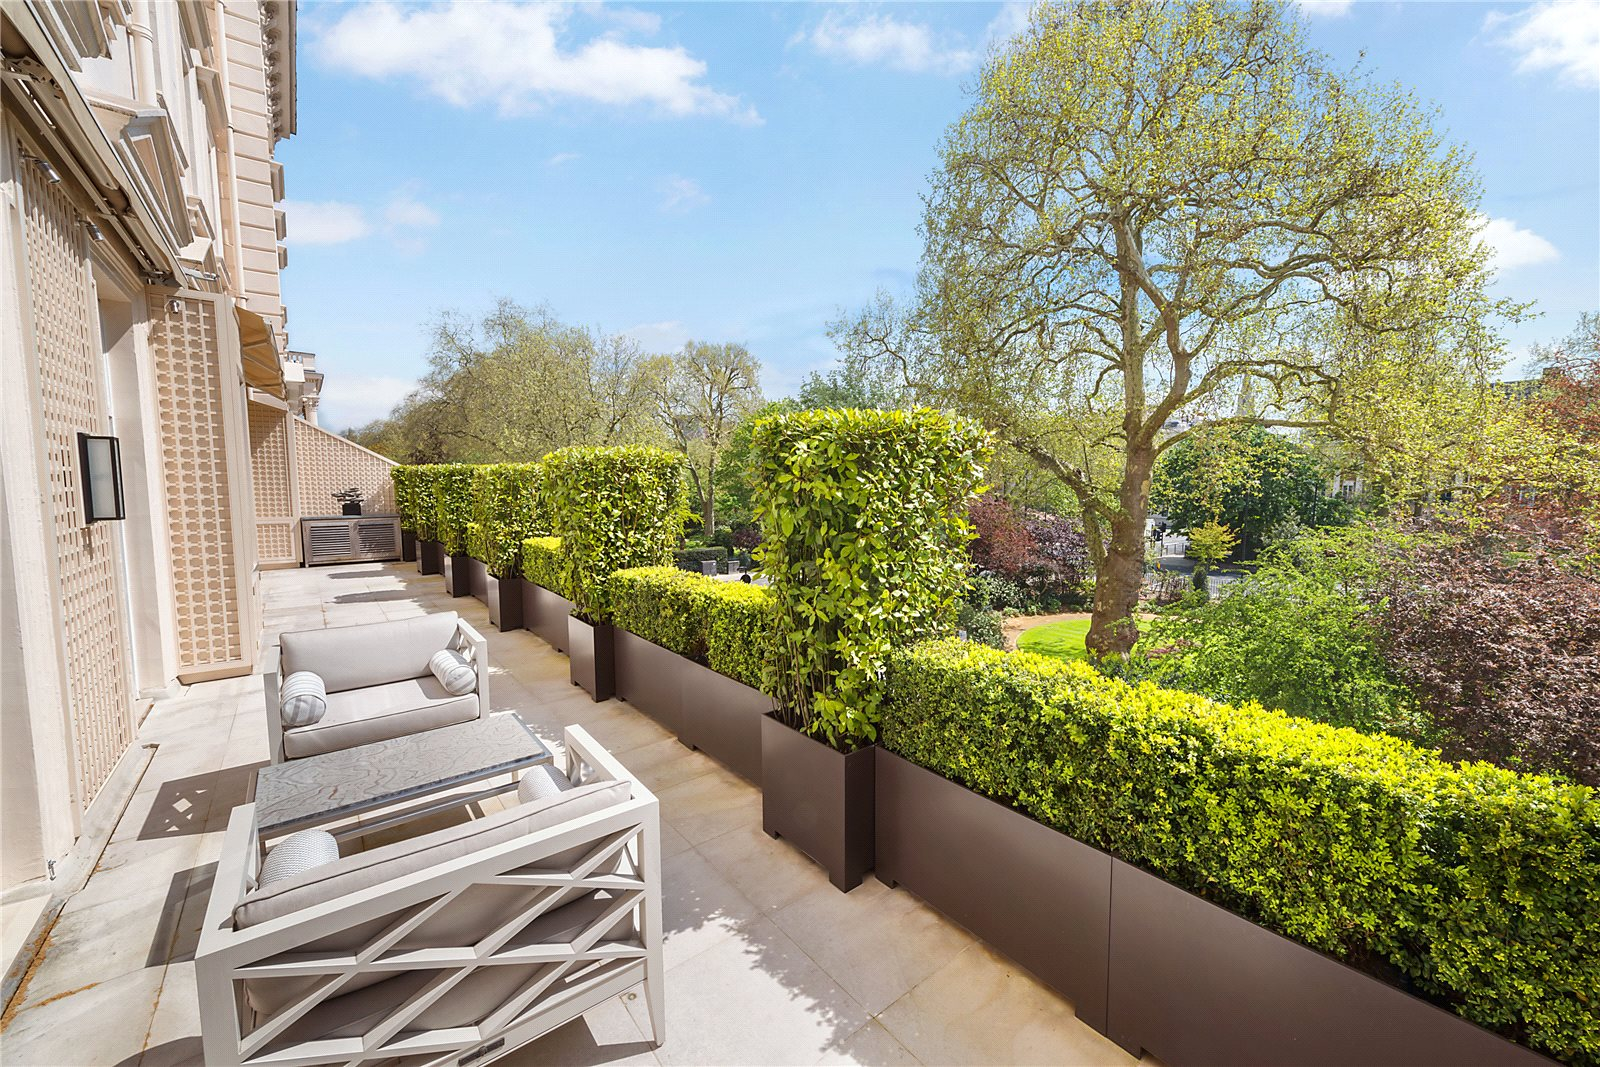 公寓 為 出售 在 Eaton Square, Belgravia, London, SW1W Belgravia, London, 英格蘭